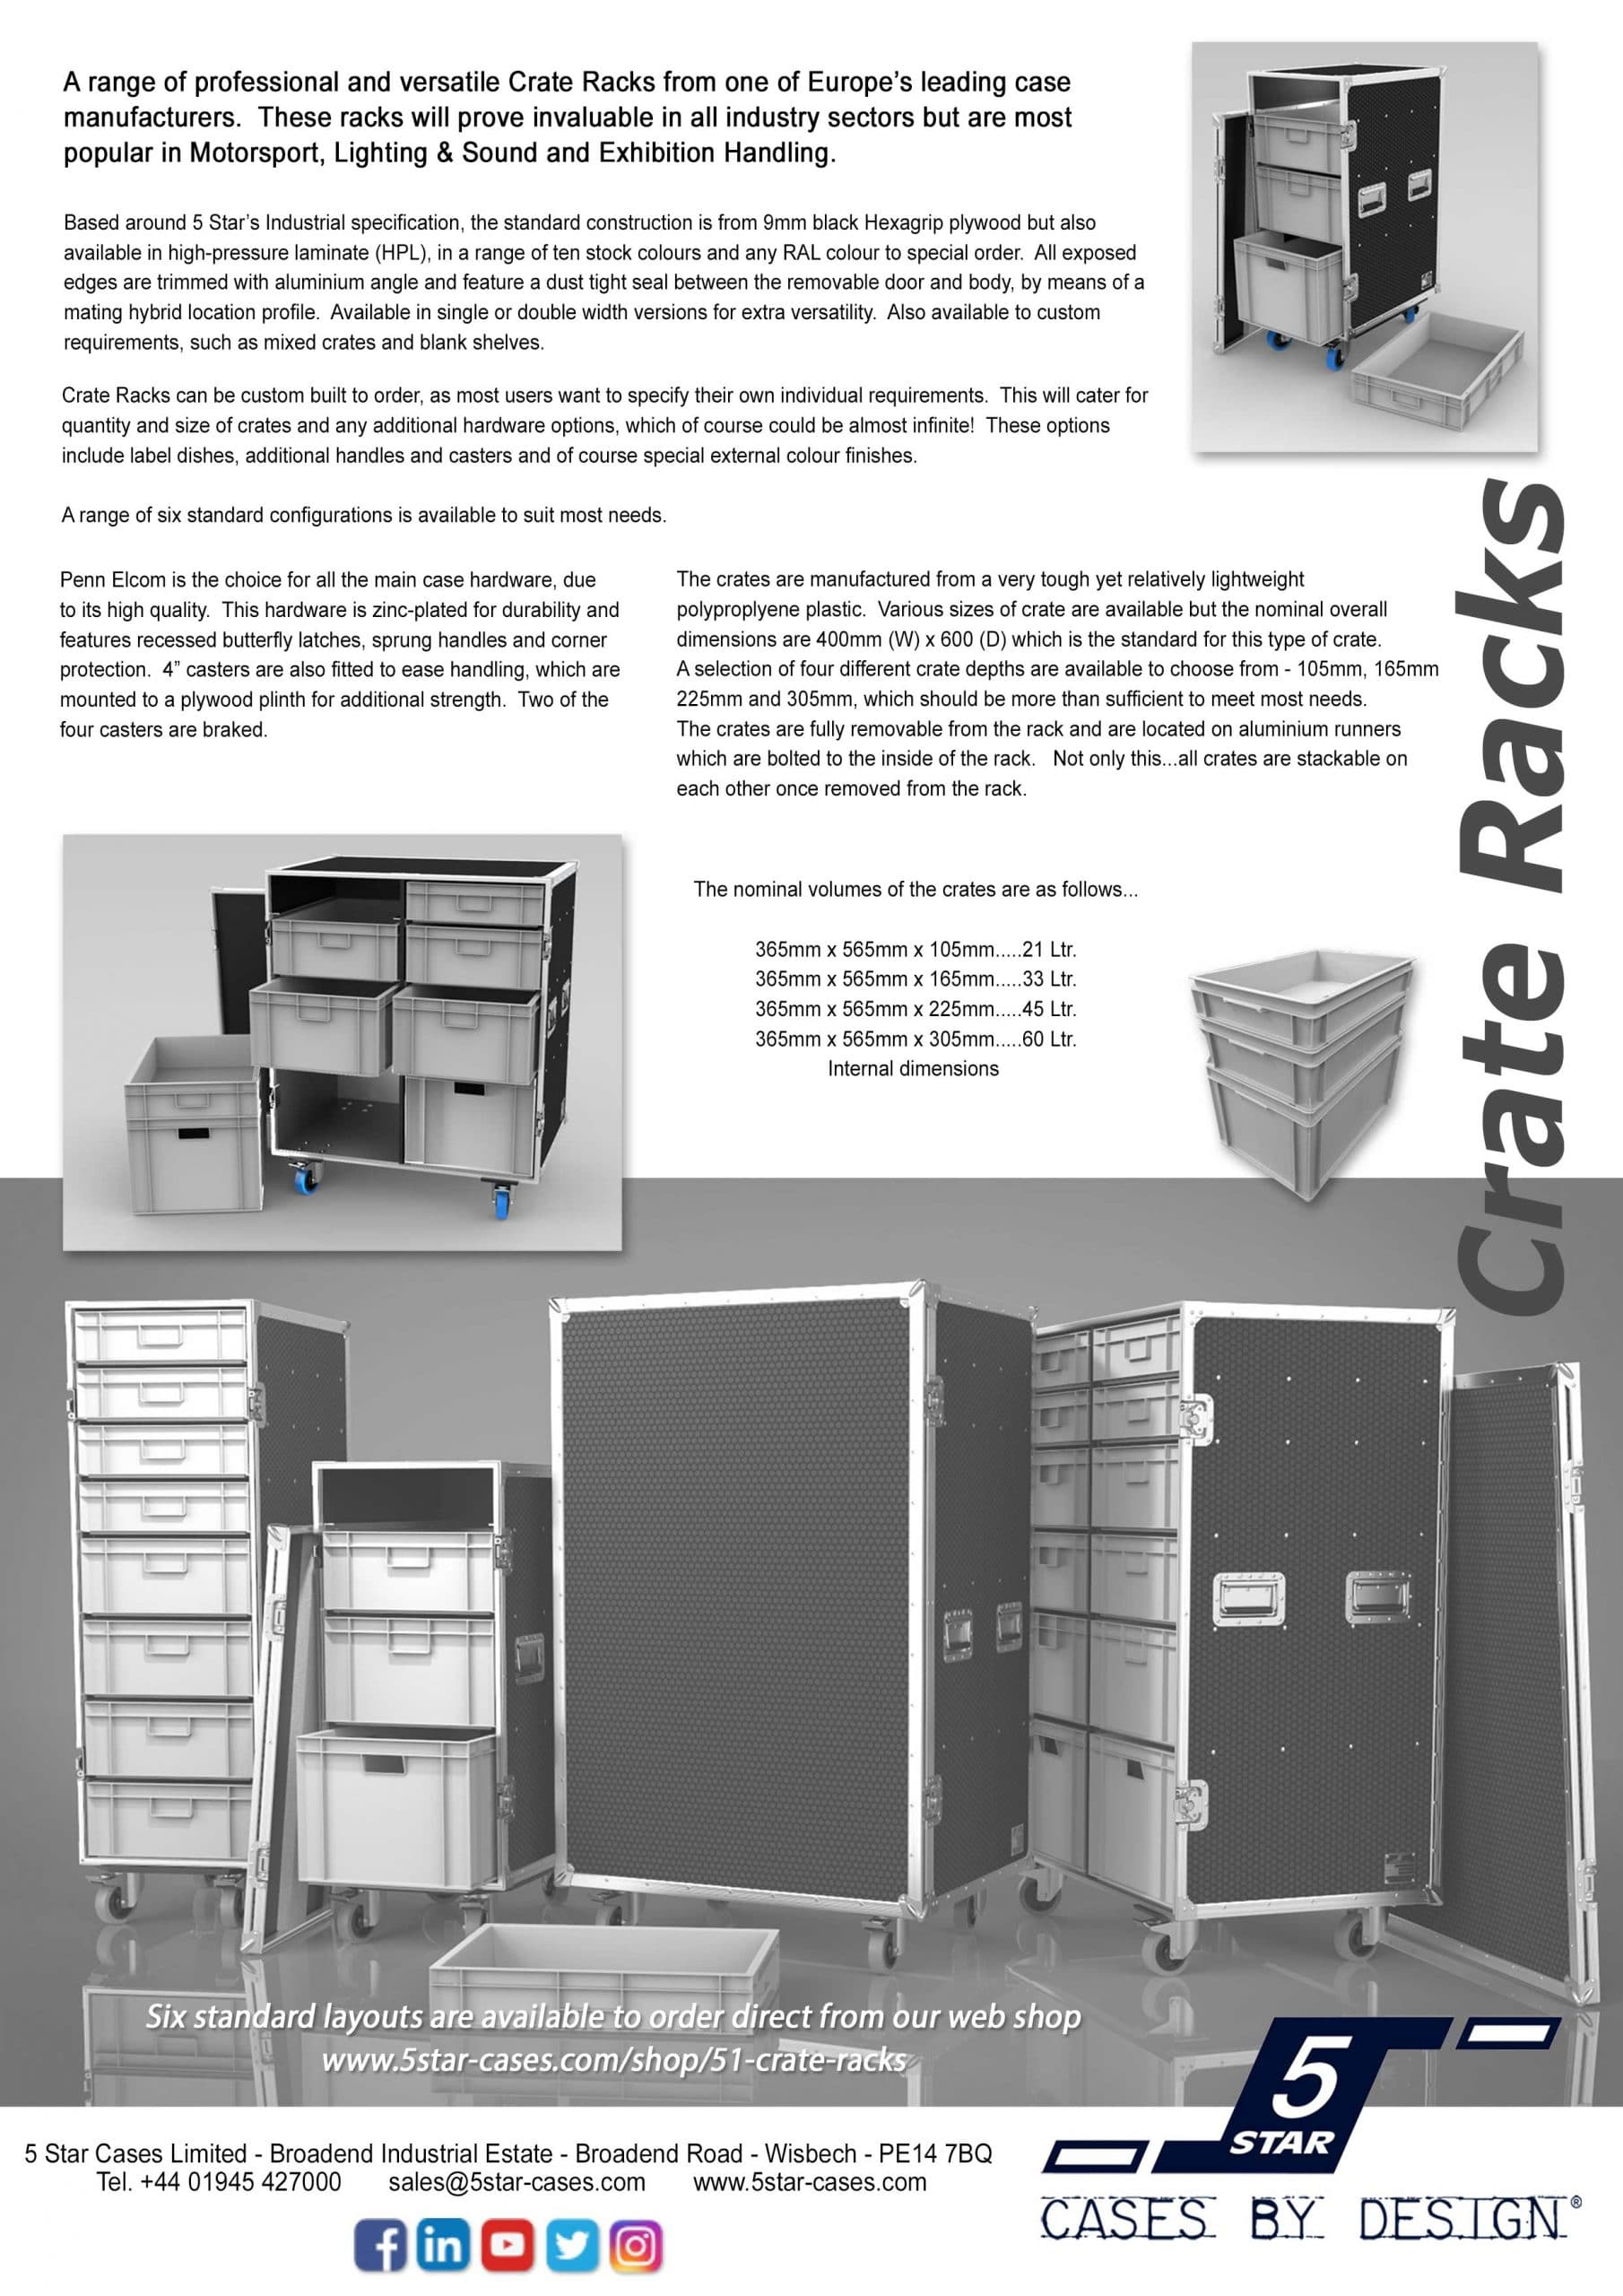 Crate-Racks-Leaflet-2021